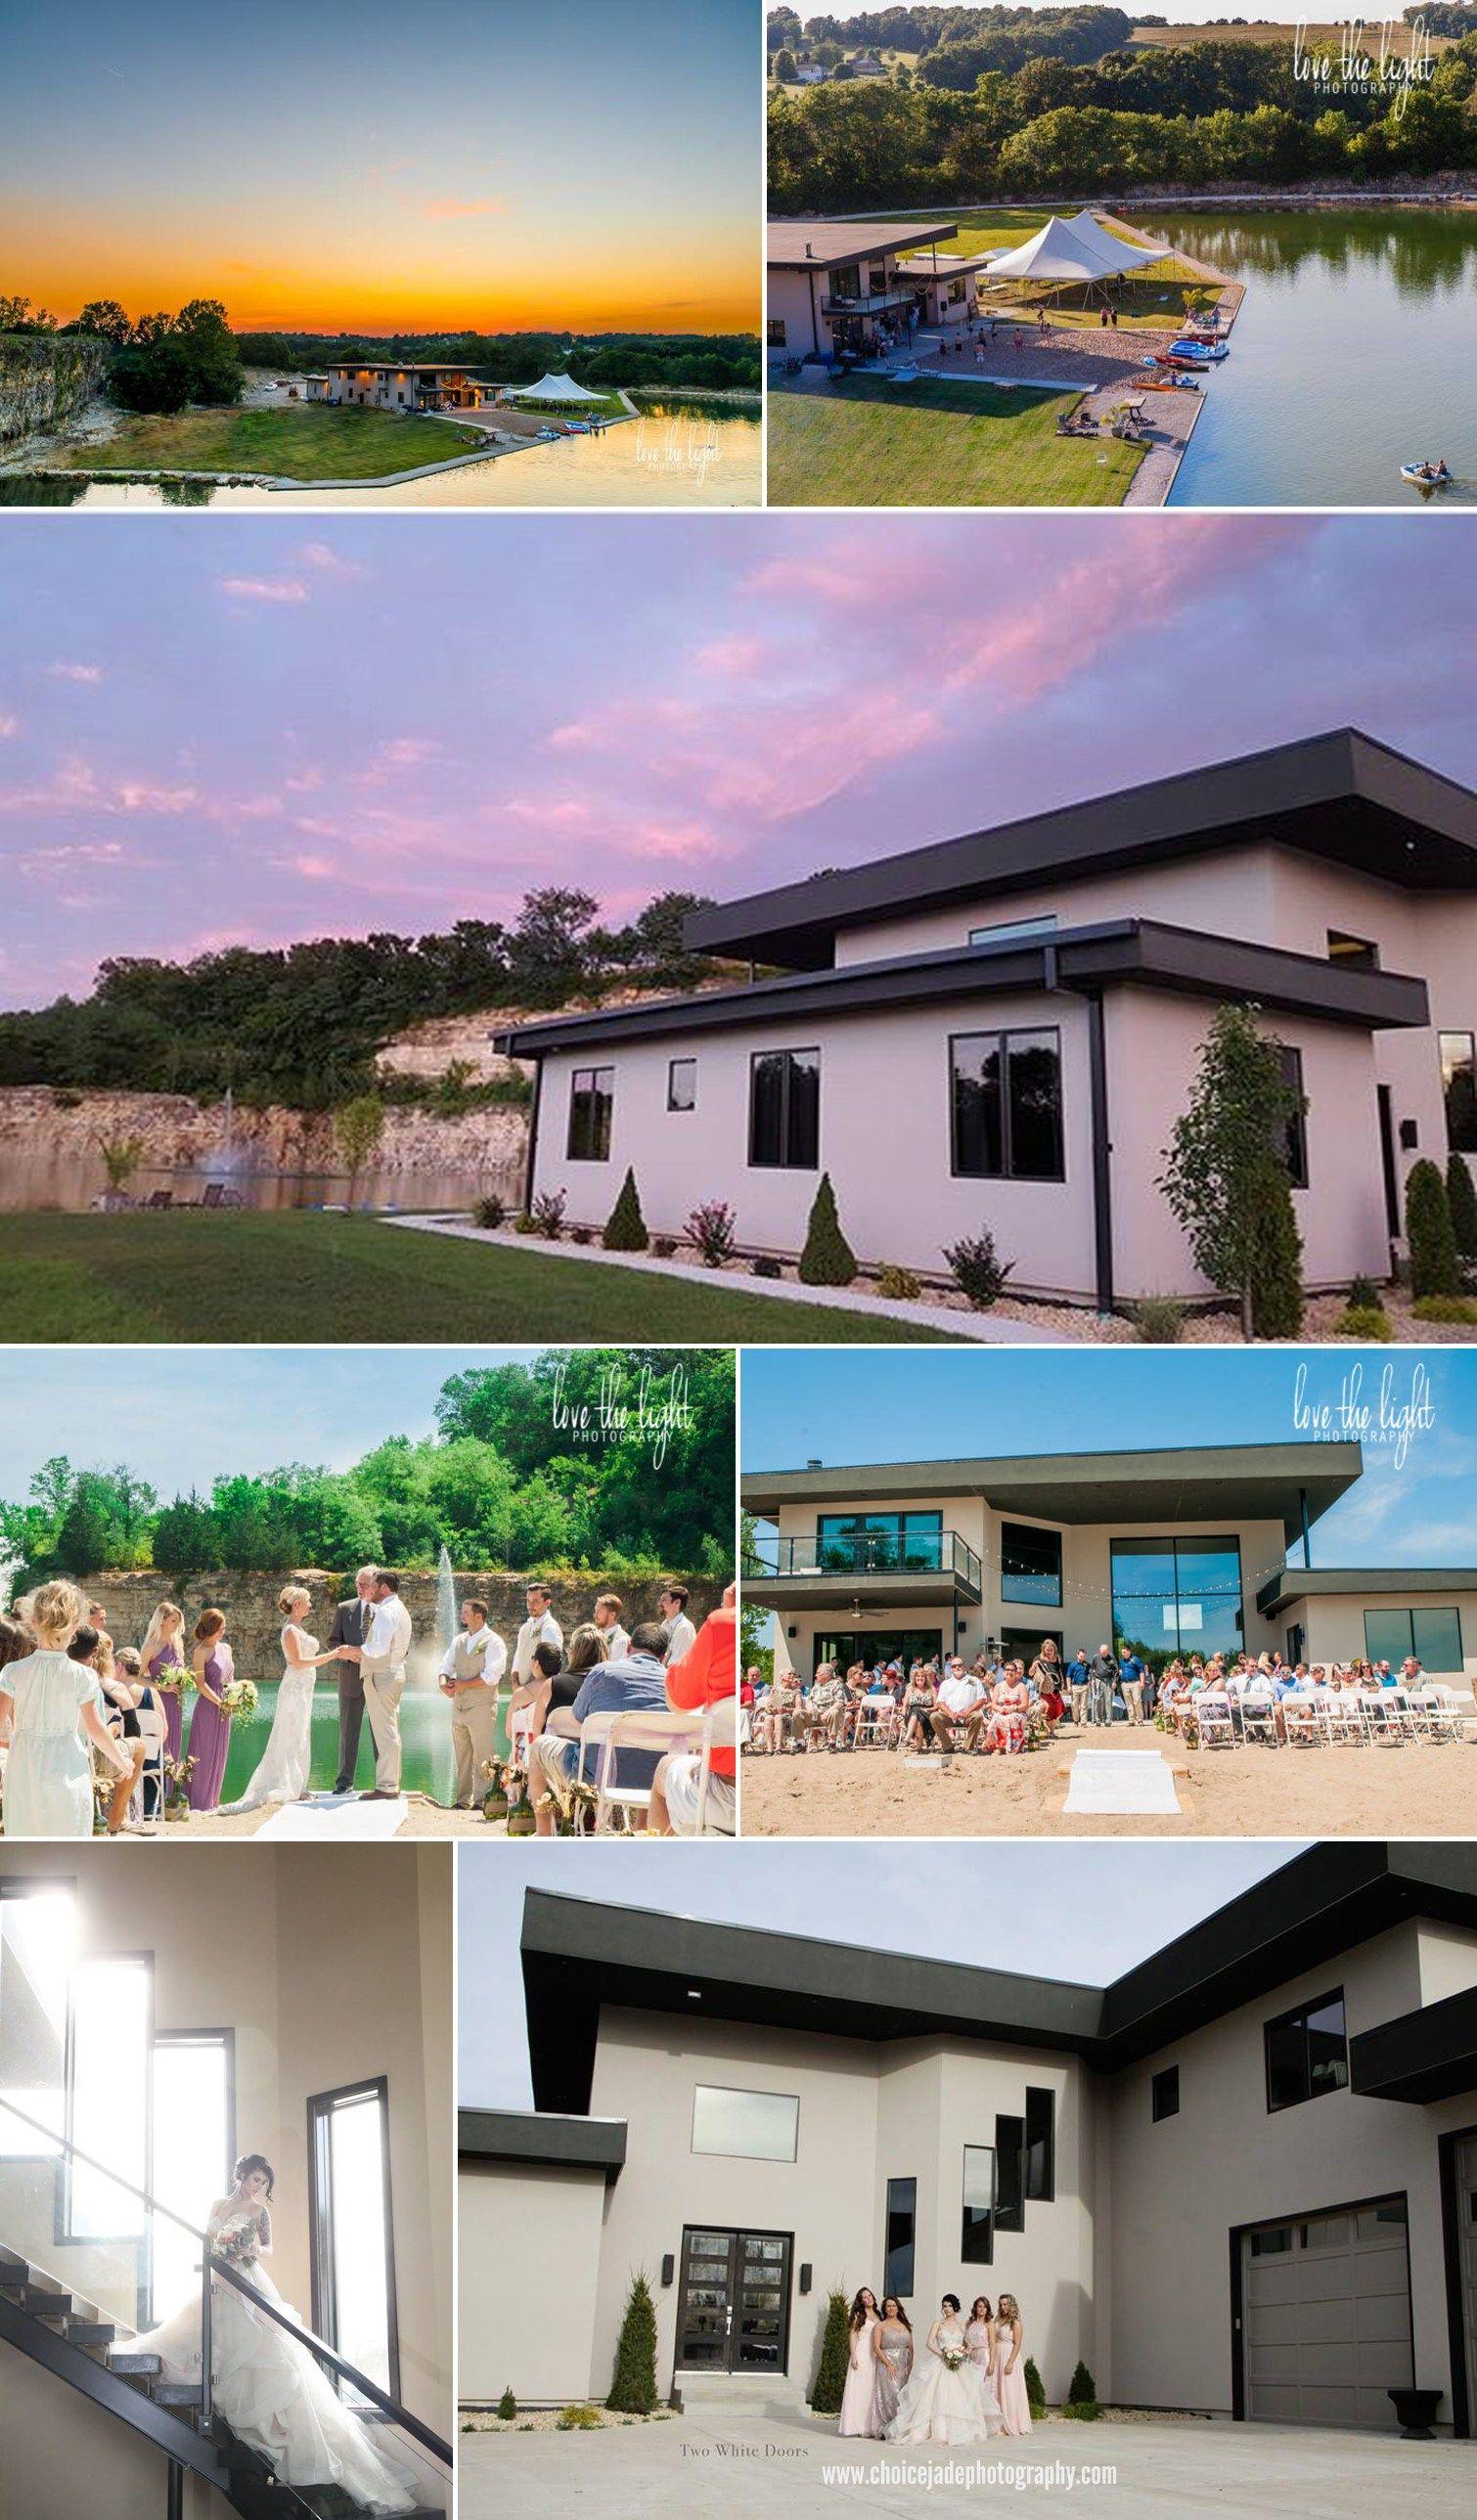 5 Amazing New Wedding Venues in St. Louis | Wedding venues ...